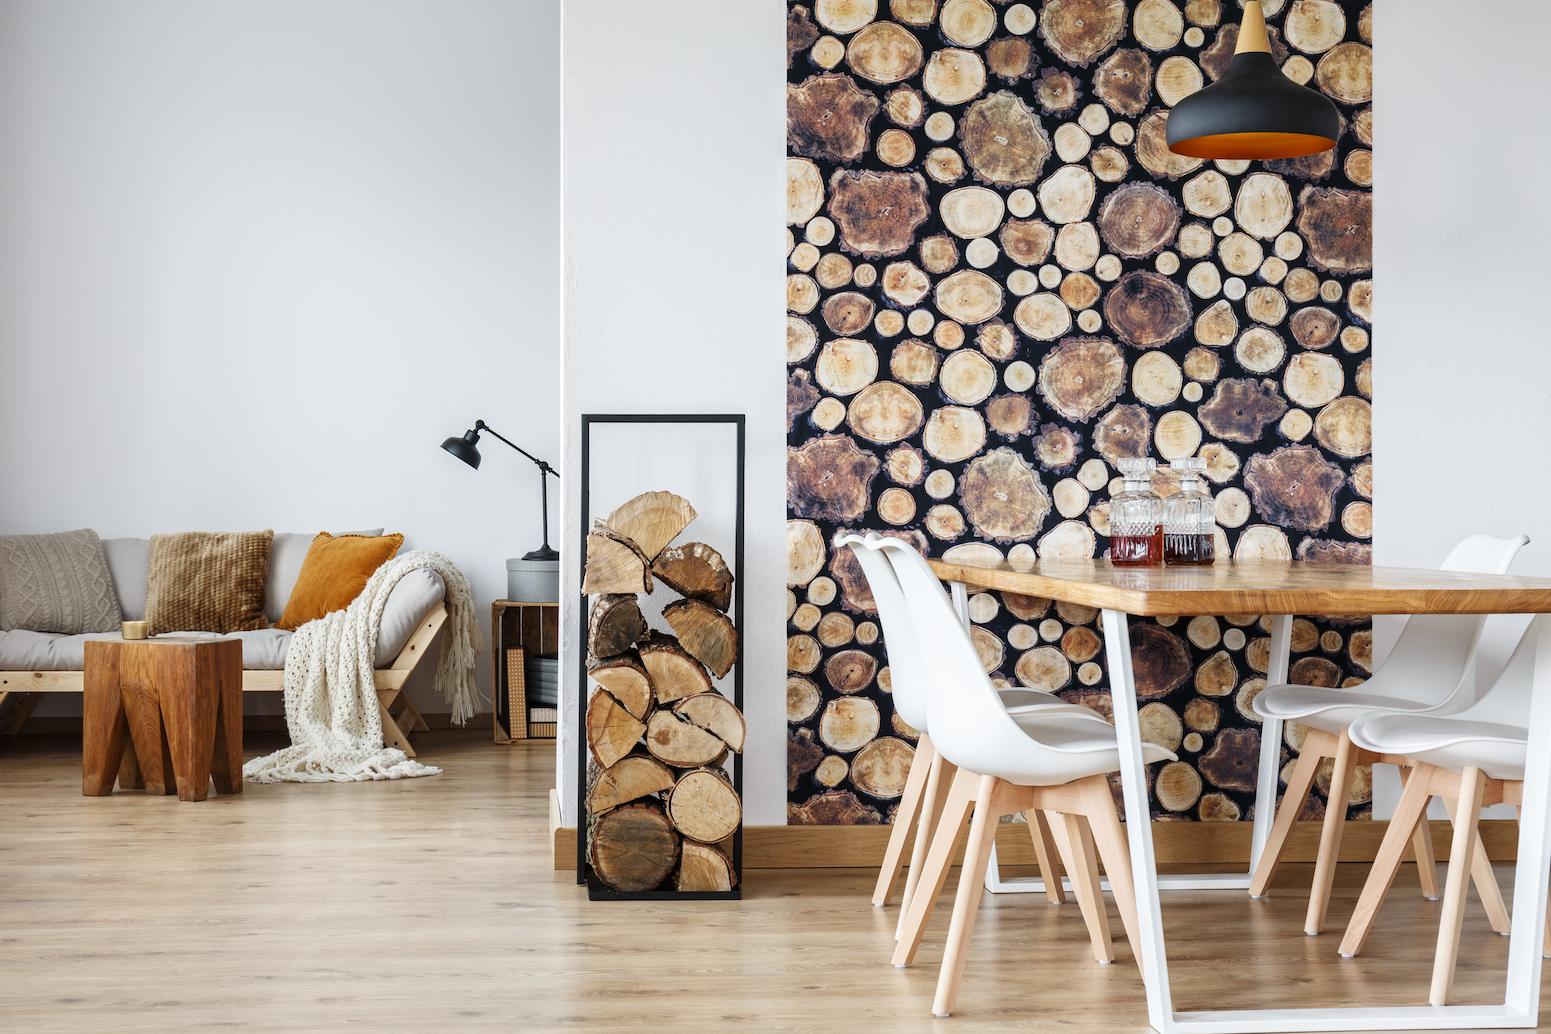 stacked-wood-dining-room_how-to-choose-hardwood-floor.jpg